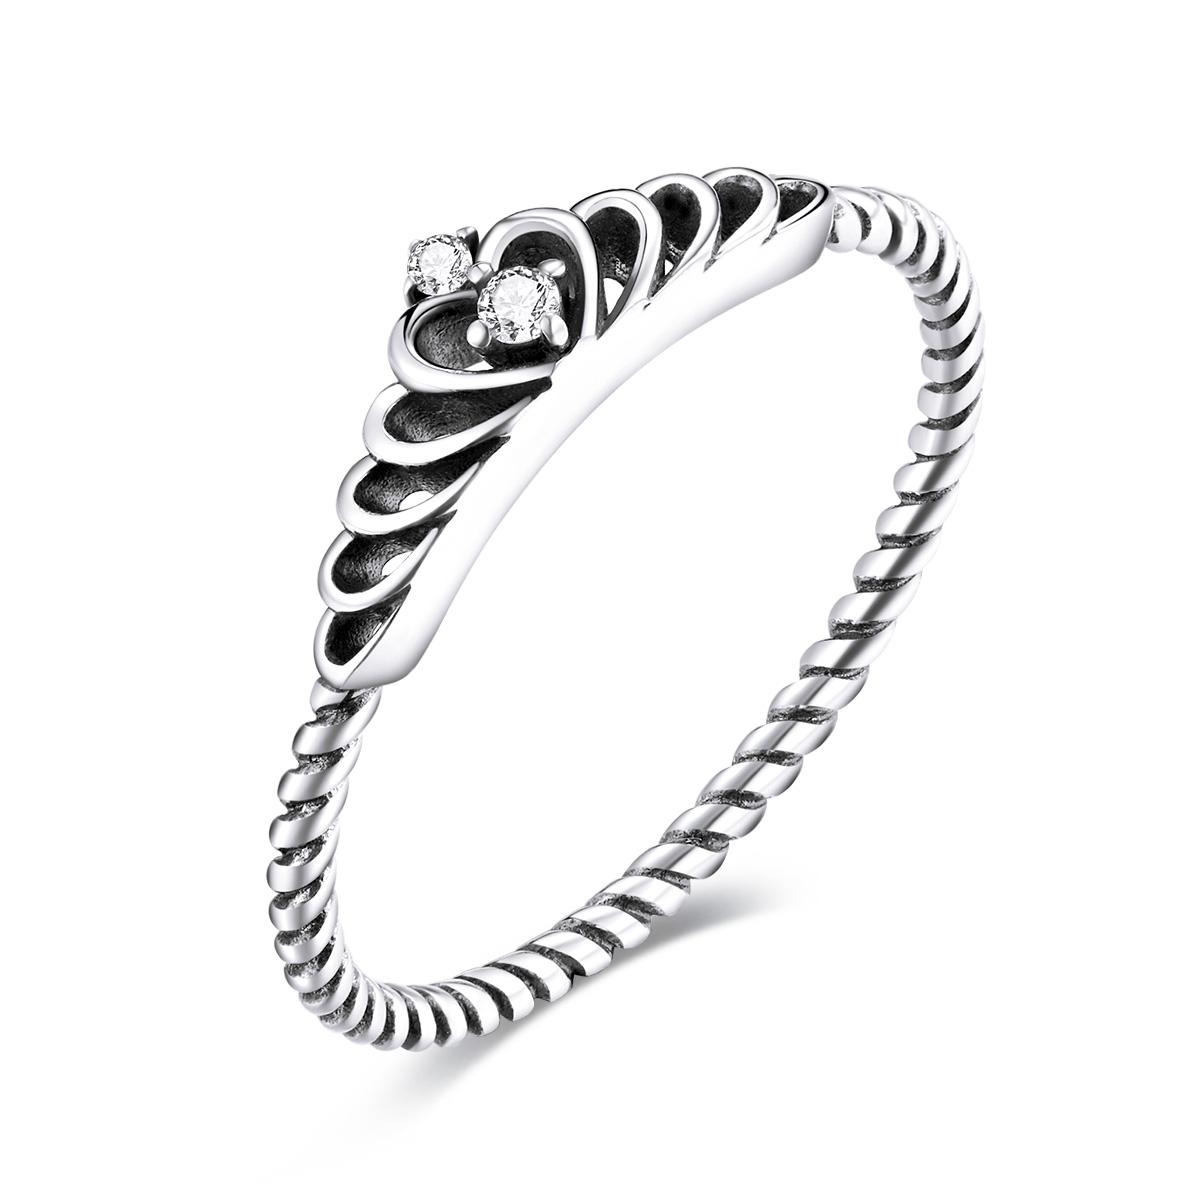 Levně Linda's Jewelry Stříbrný prsten Tiara Ag 925/1000 IPR081